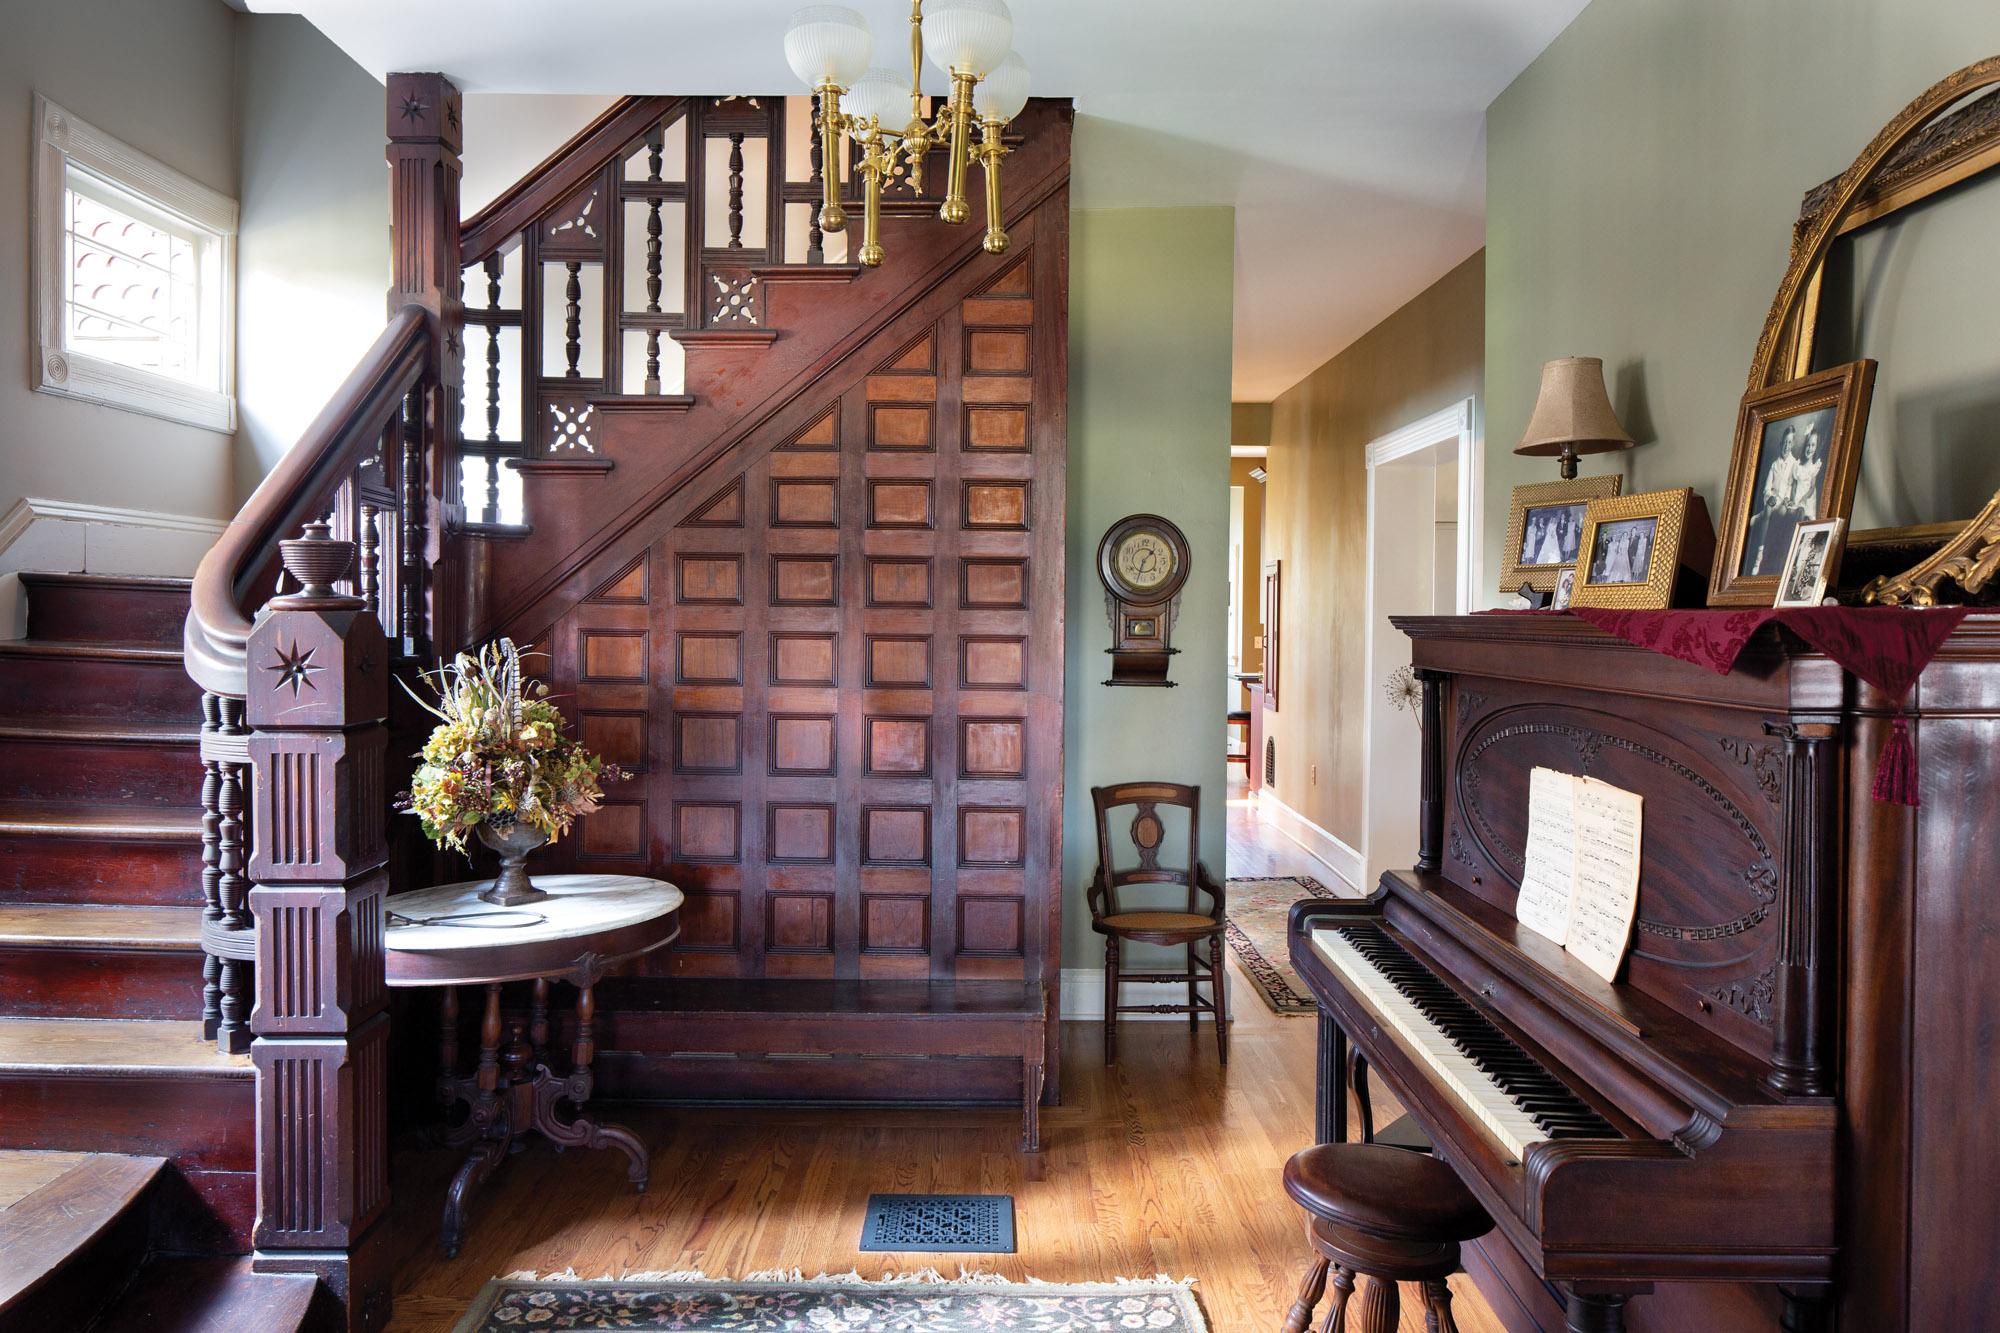 Queen Anne staircase